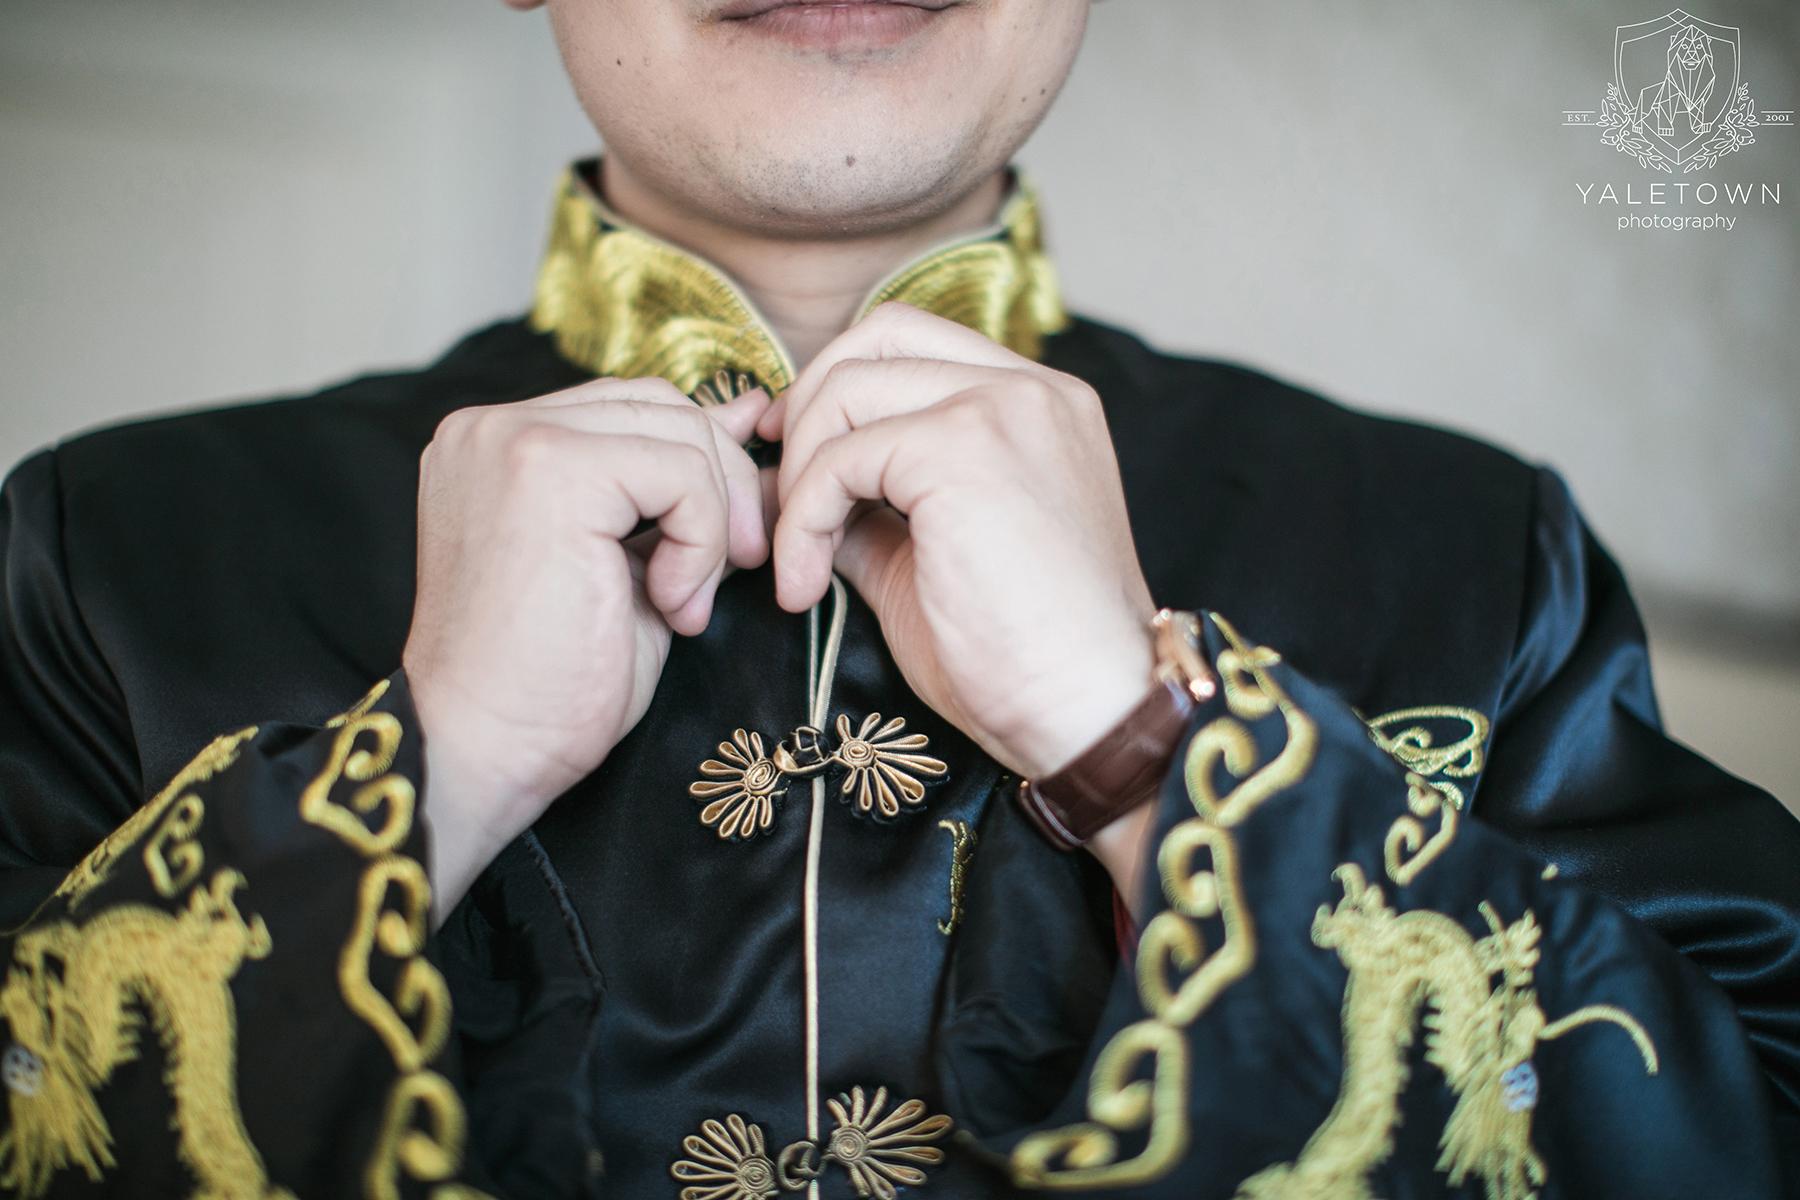 Chinese-Tea-Ceremony-Groom-Prep-Rosewood-Hotel-Georgia-Vancouver-Wedding-Yaletown-Photography-photo